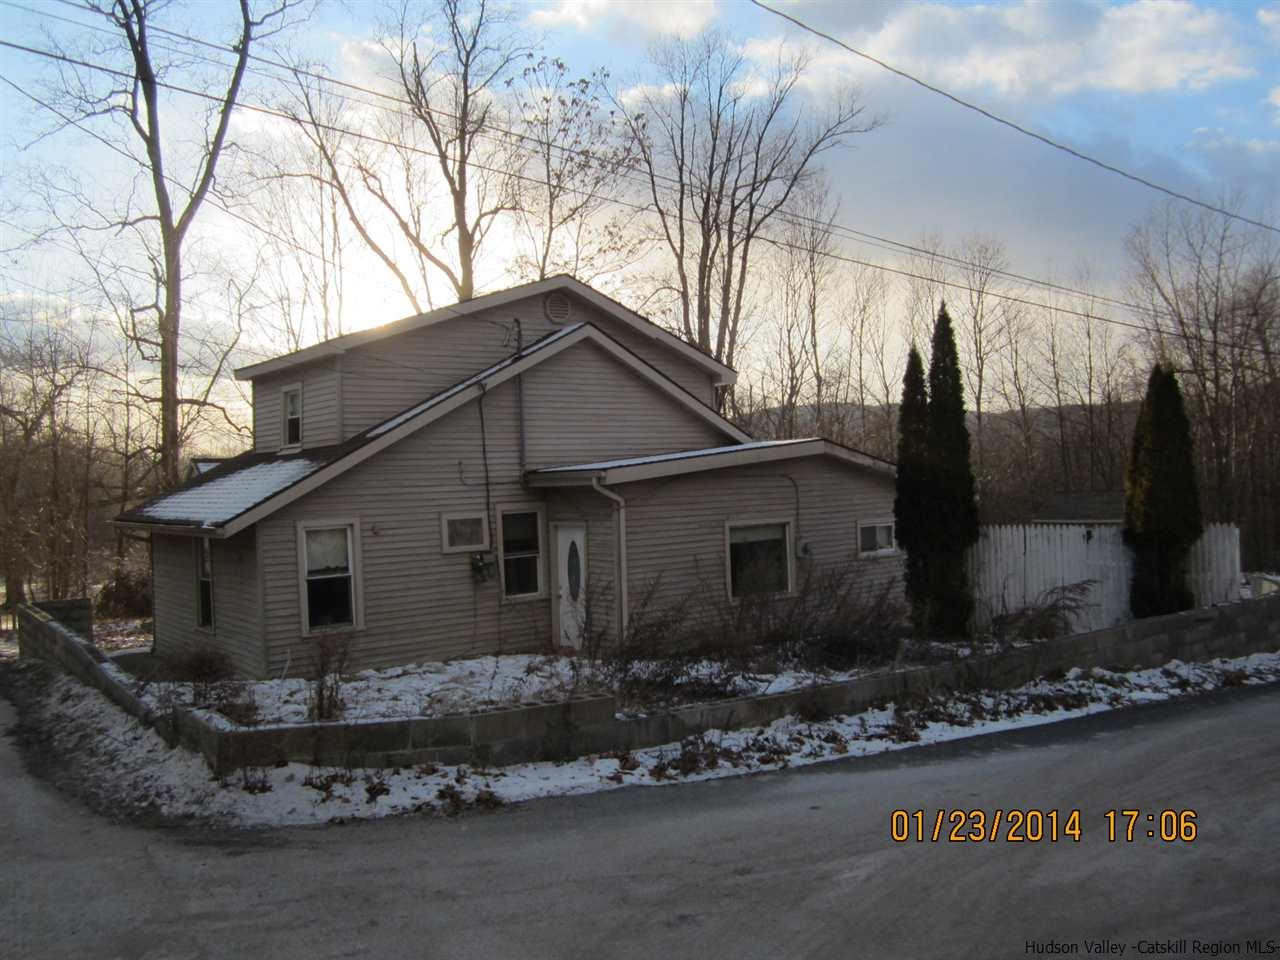 Single Family Home for Sale at 263 Berme Road 263 Berme Road Ellenville, New York 12428 United States